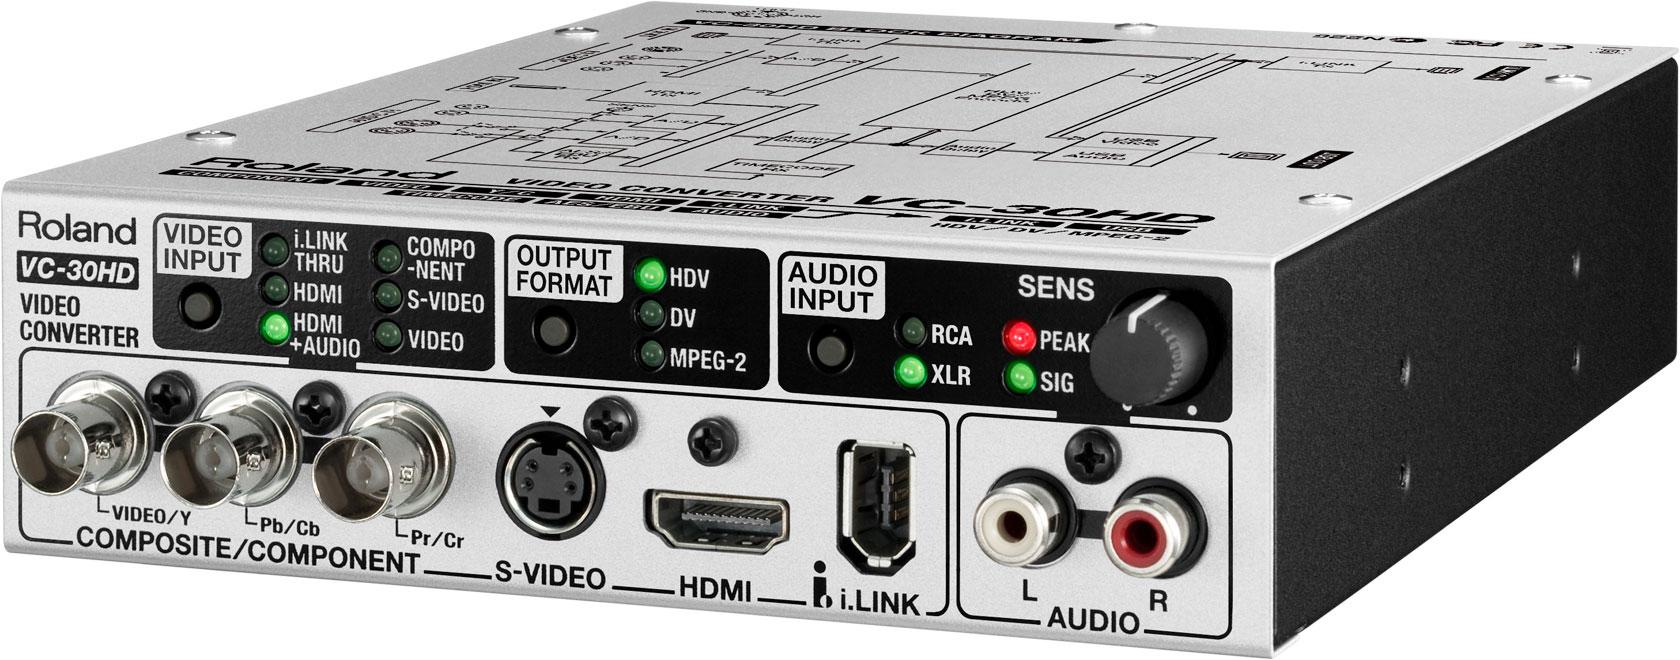 Roland Pro A V Vc 30hd Video Converter